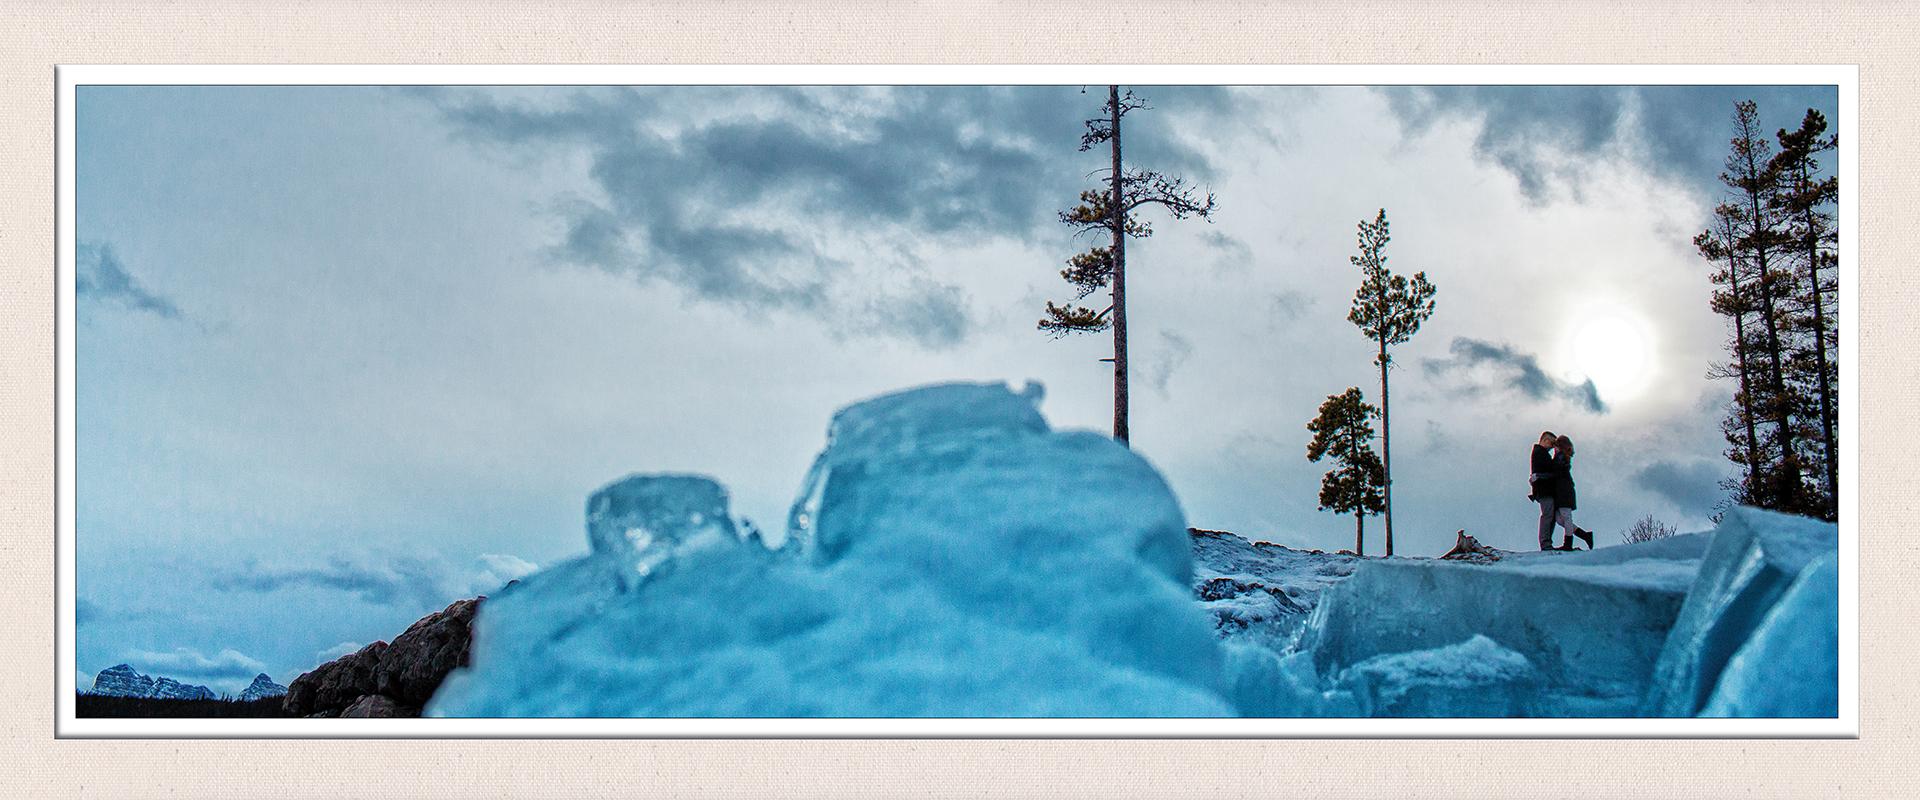 Seasons engagement album, winter :: Caitlyn + Jordan pages 20-21